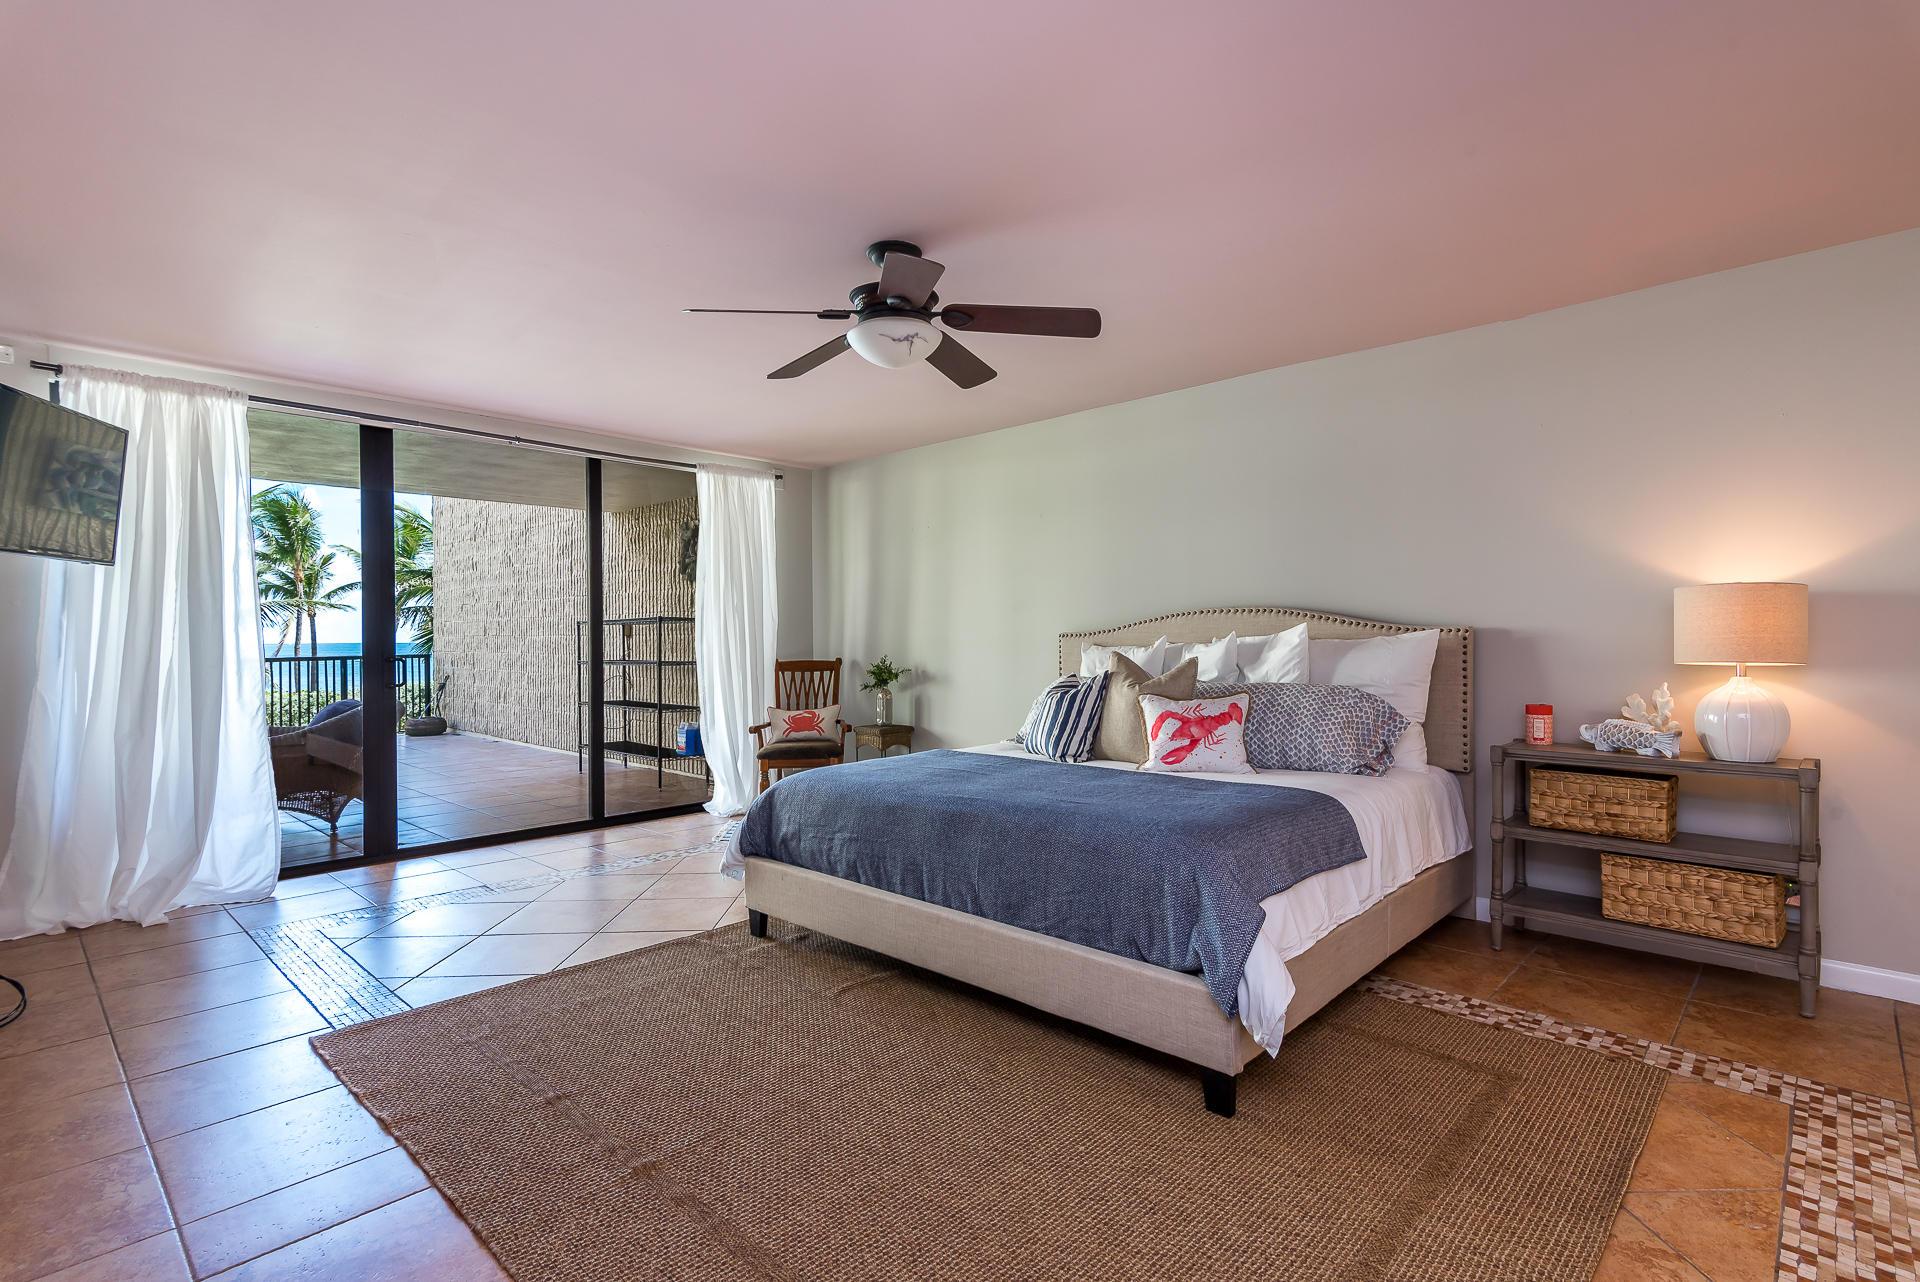 1167 Hillsboro Mile, Hillsboro Beach, Florida 33062, 2 Bedrooms Bedrooms, ,2.1 BathroomsBathrooms,Condo/Coop,For Sale,Hillsboro Mile,1,RX-10463304